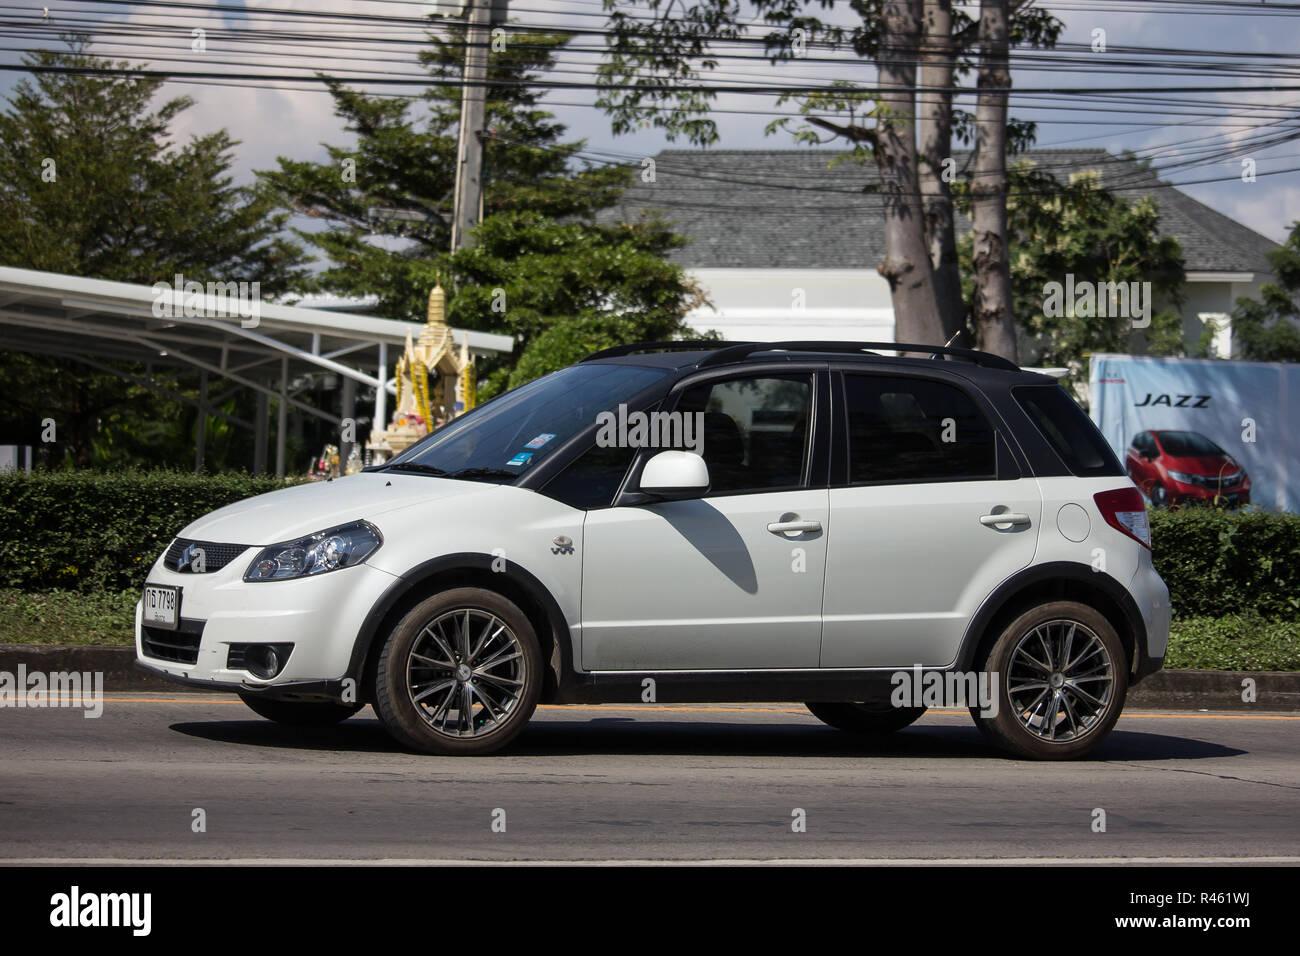 Chiangmai Thailand November 15 2018 Private Suv Car Suzuki Sx4